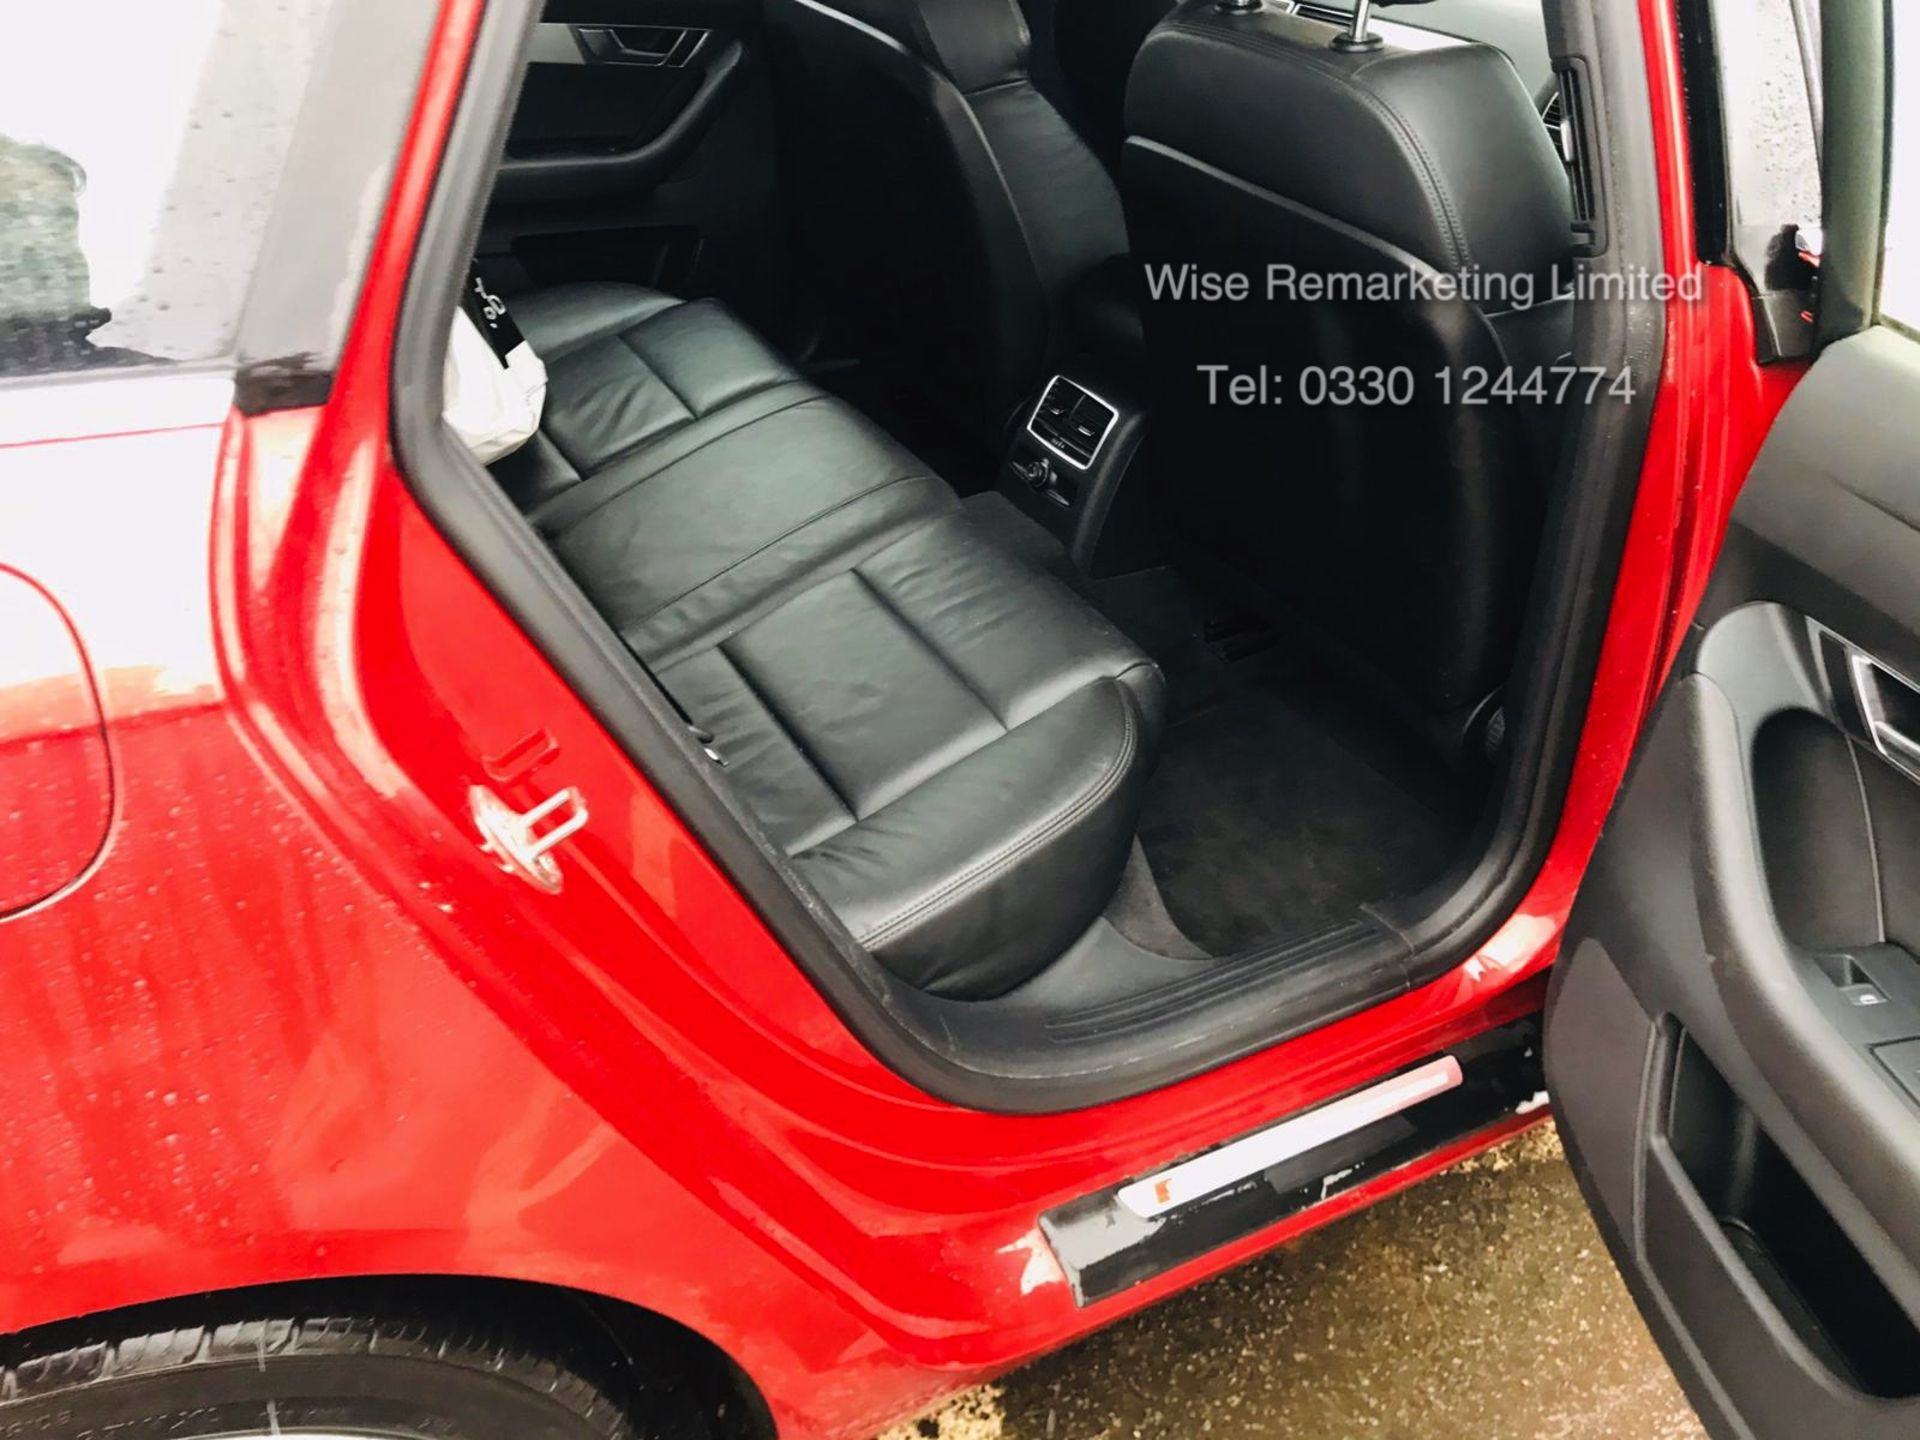 Lot 37 - Audi A6 2.0 TDI S Line - 2011 Model - Full leather - Sat Nav